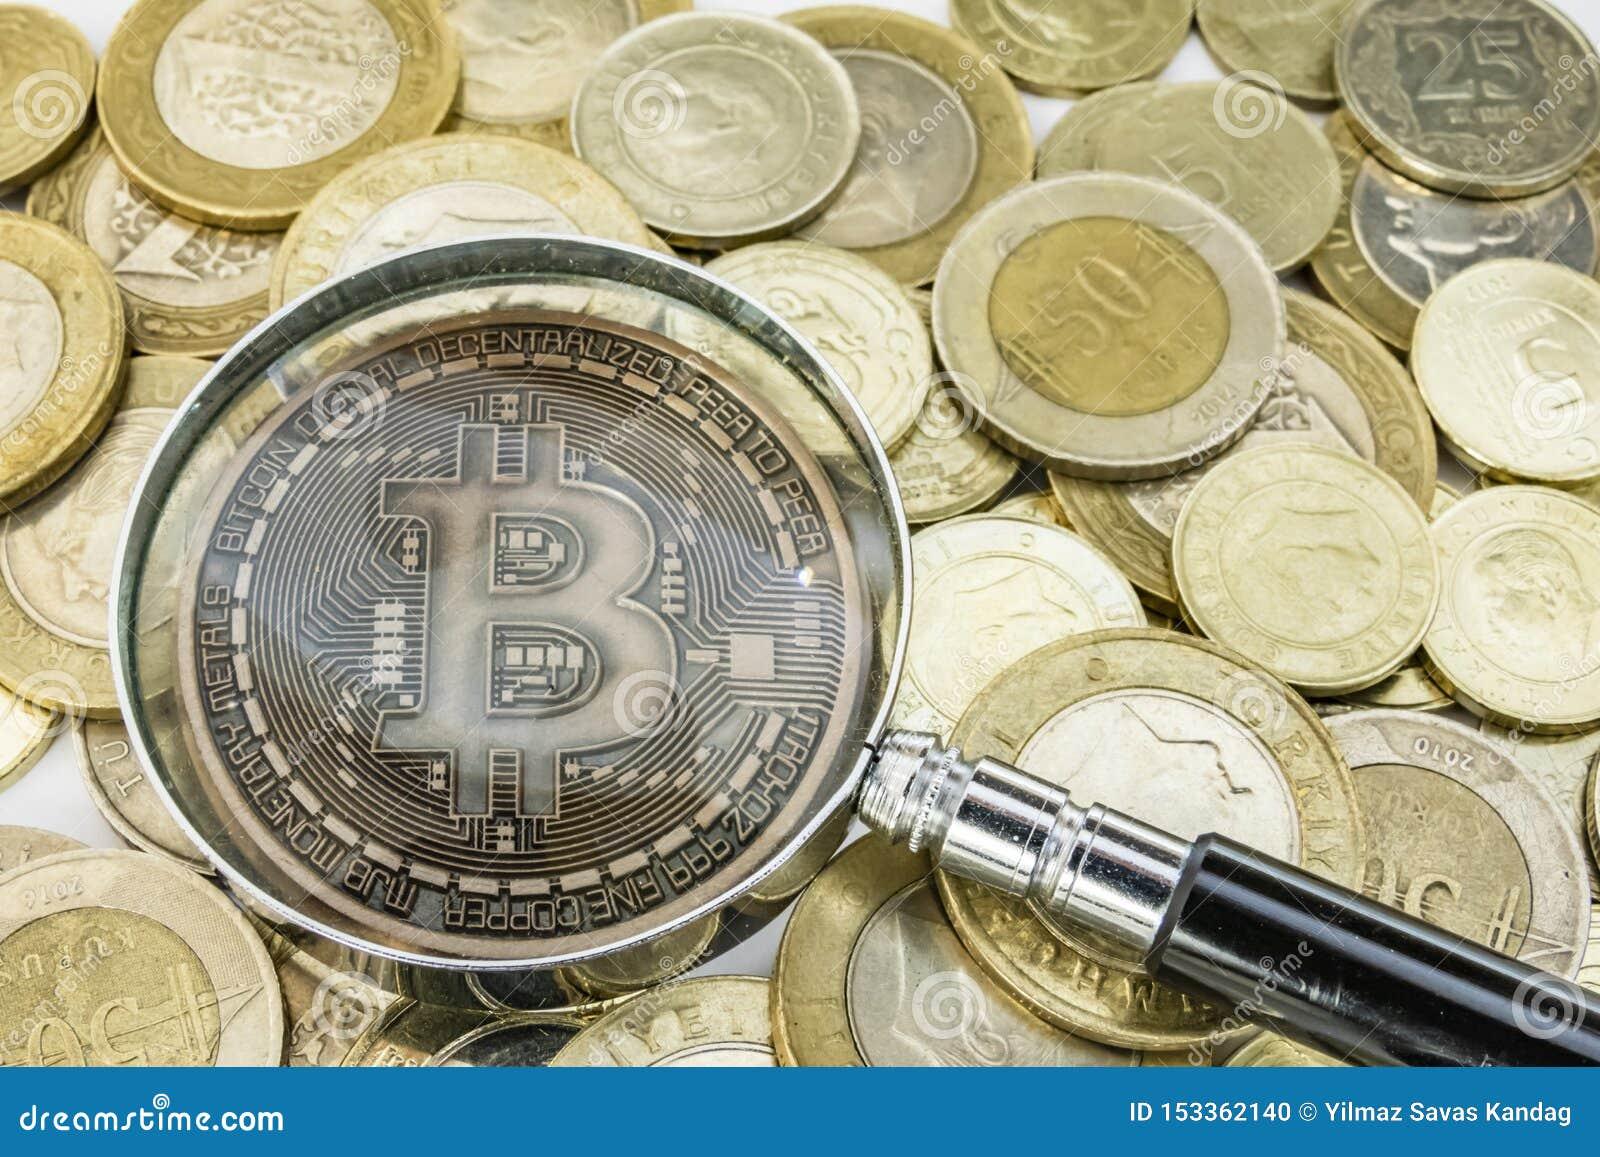 Cyripto money mining. close up physical bitcoin coin